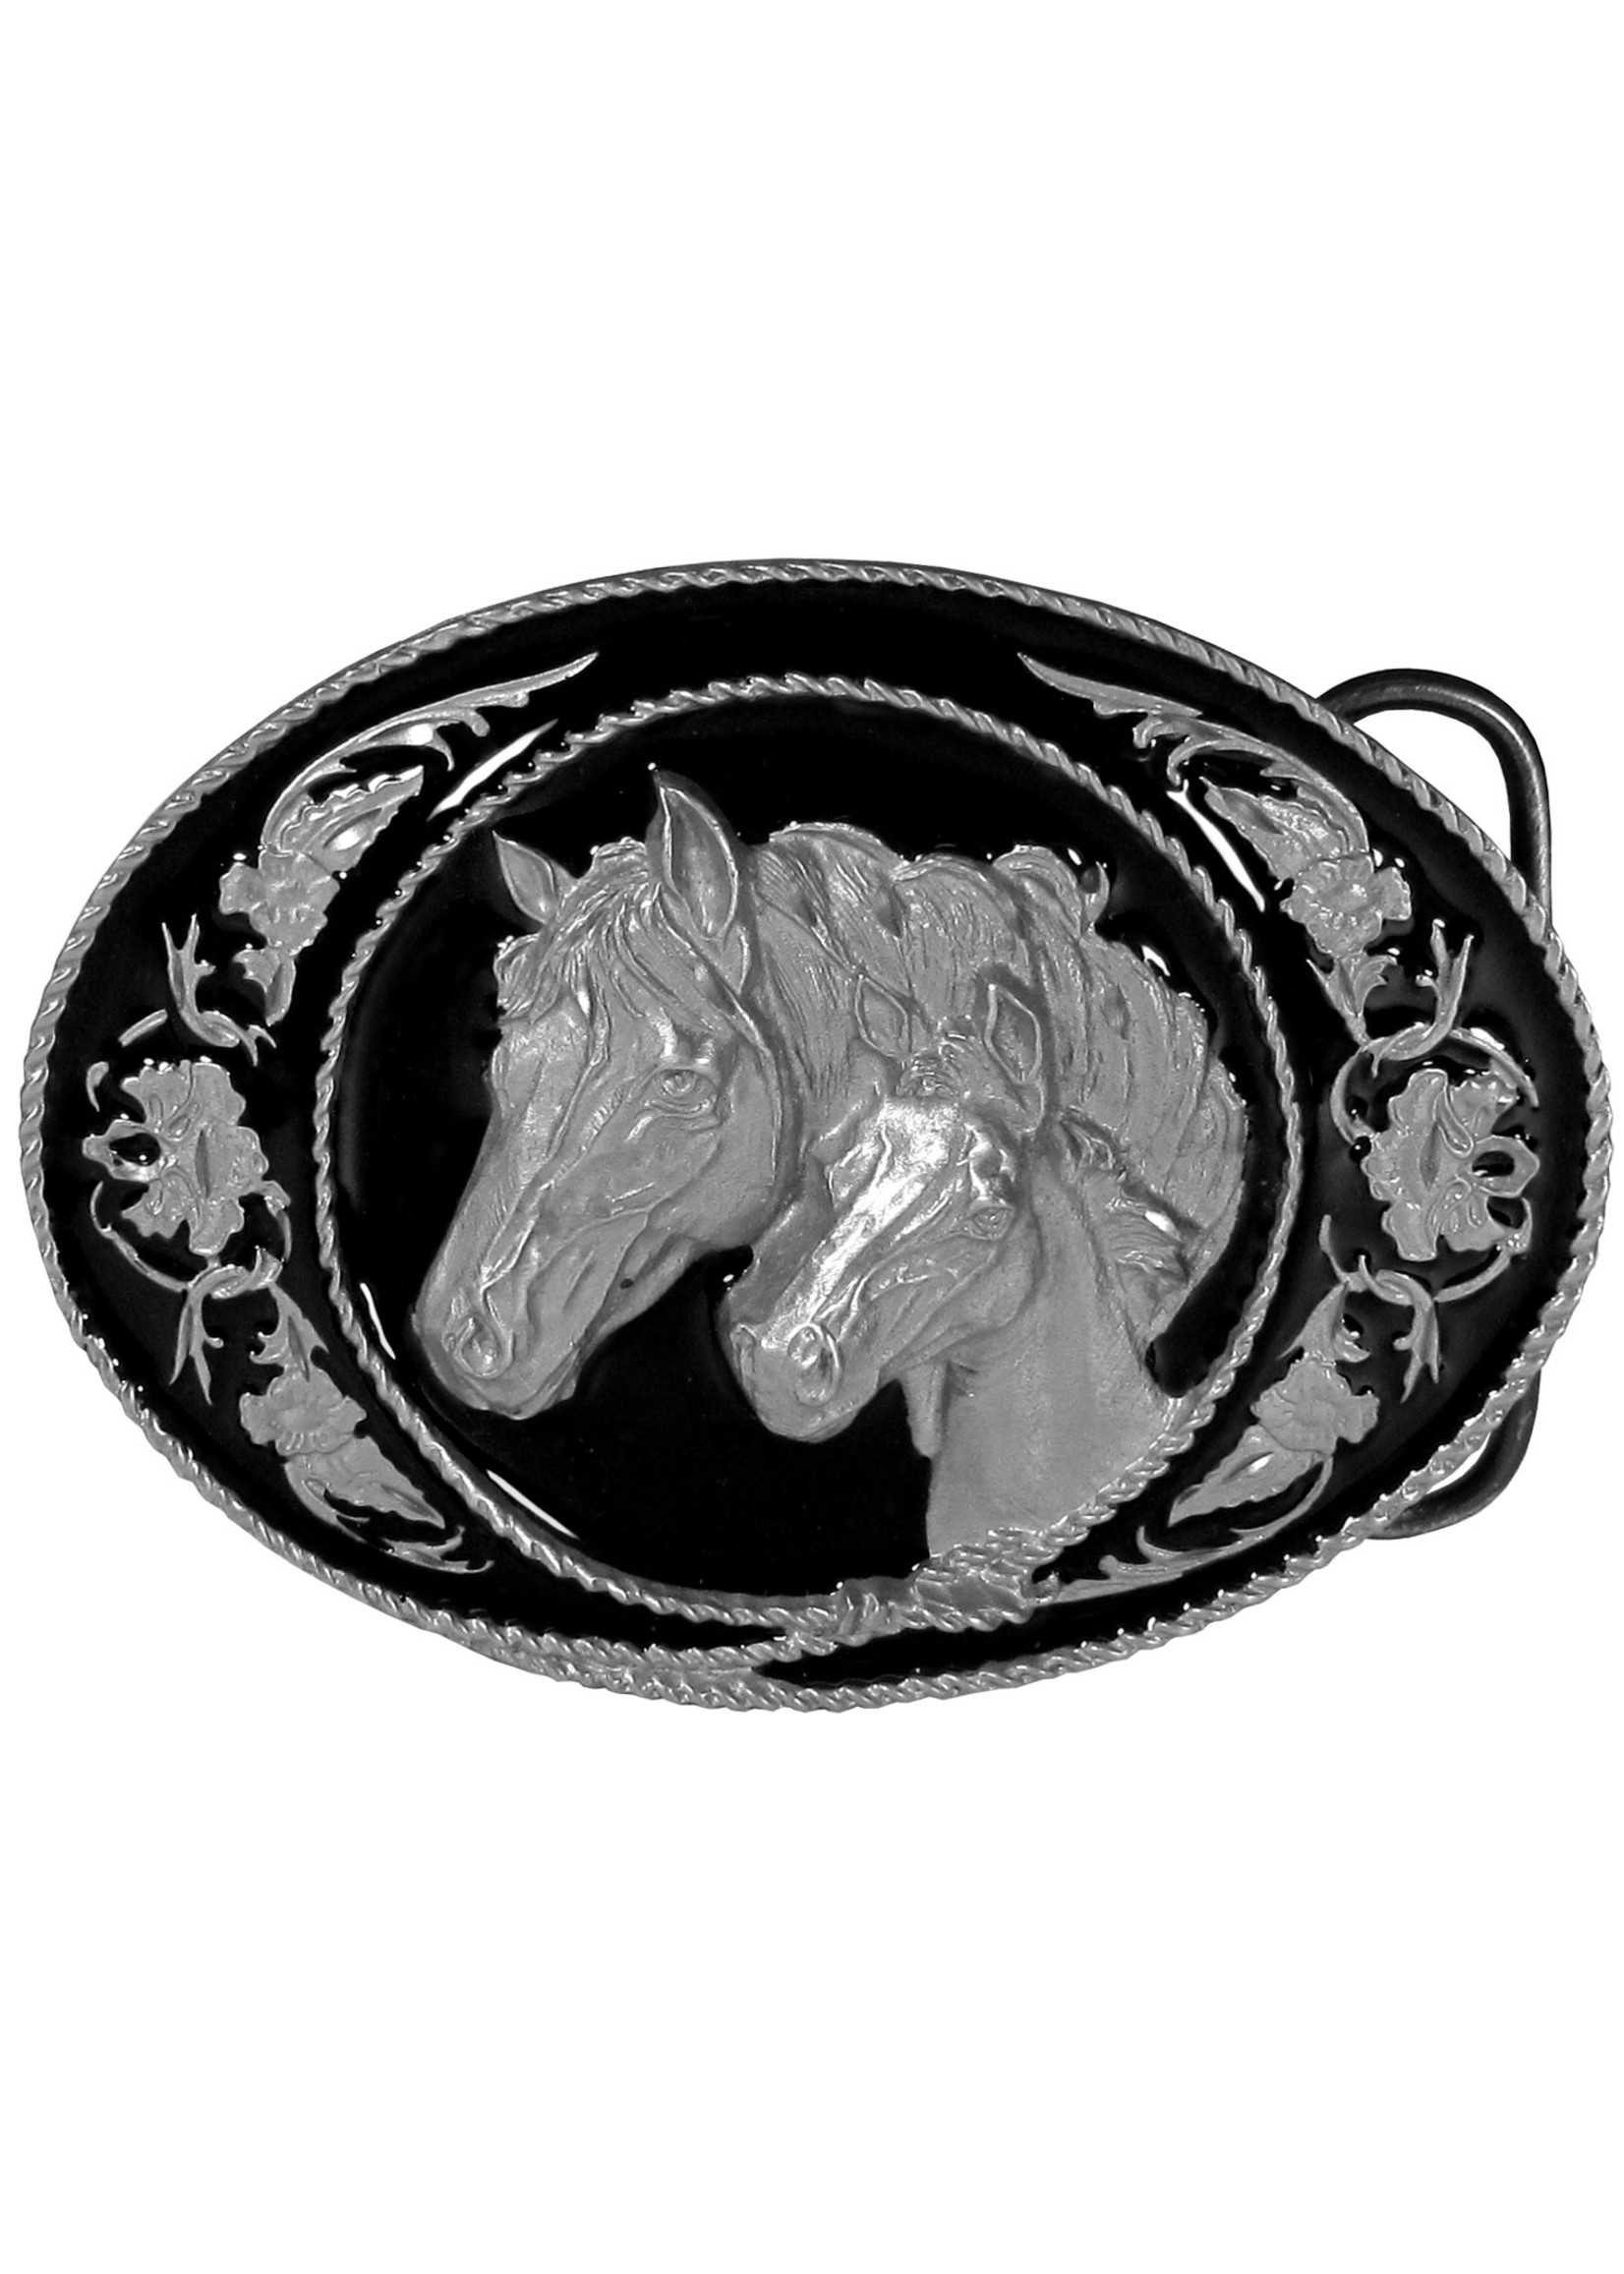 Siskiyou Gifts Horse and Colt Enameled Belt Buckle A5D